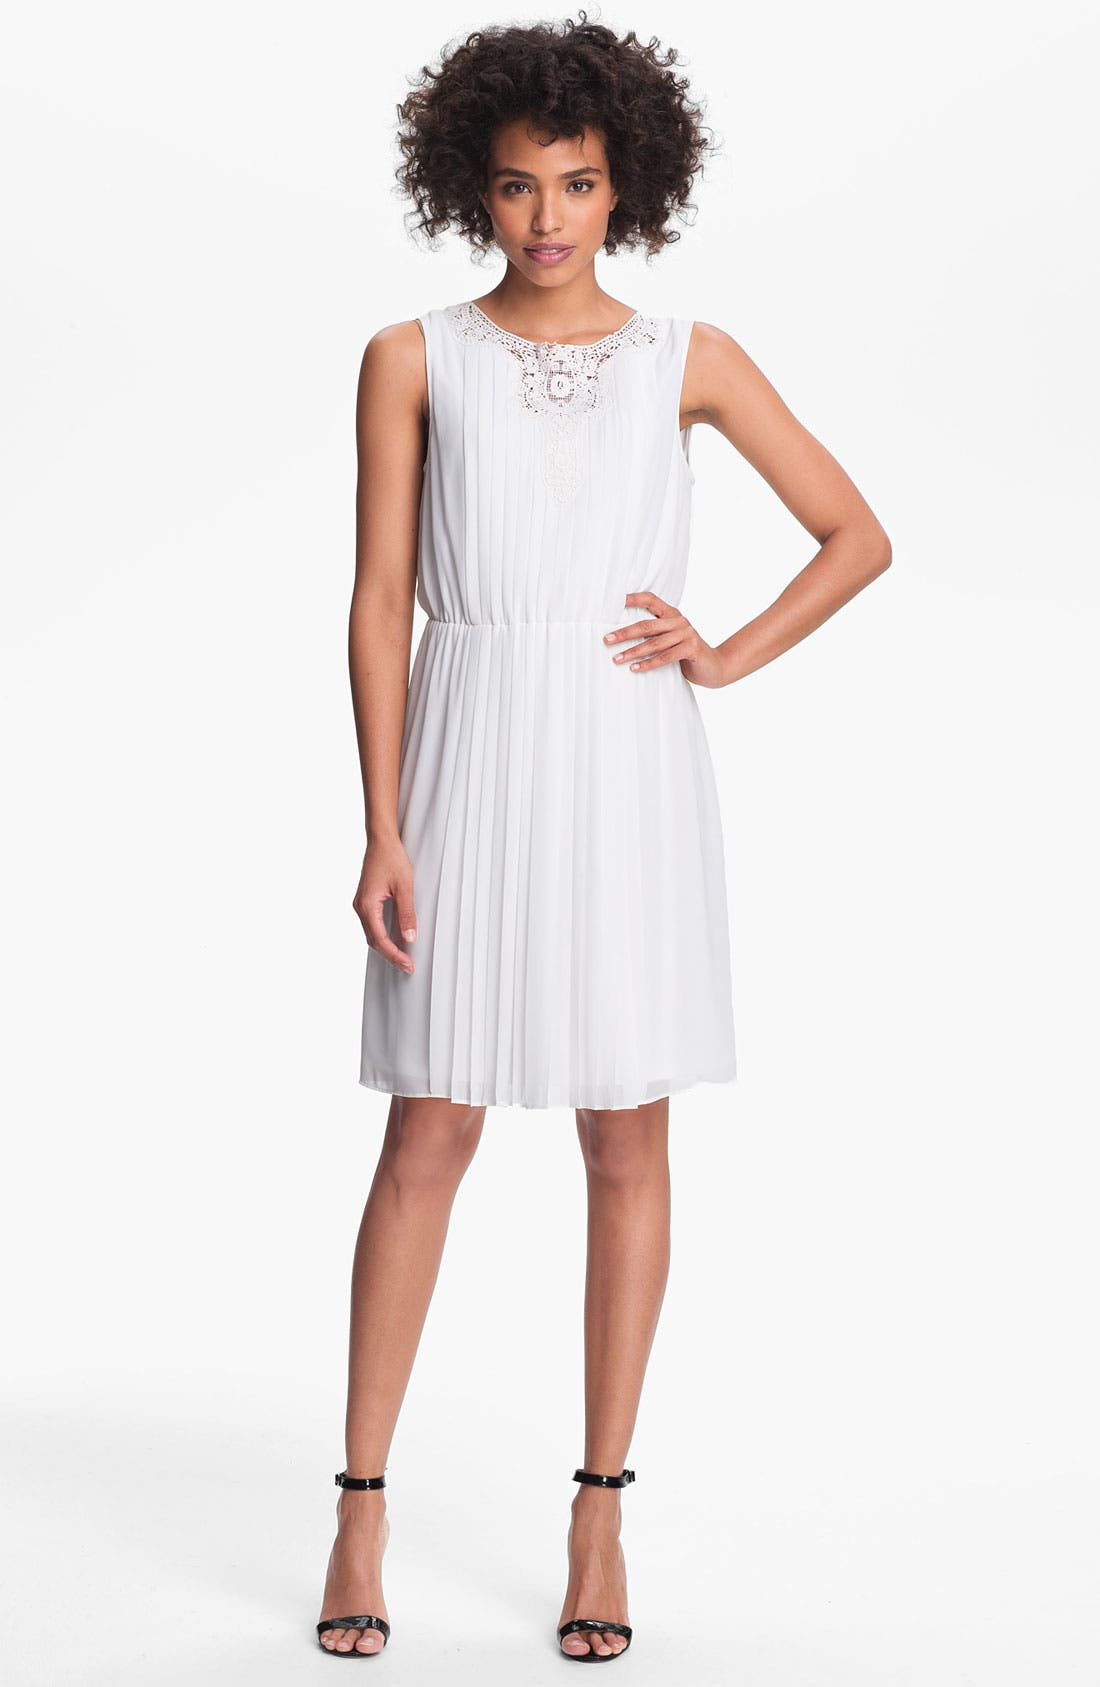 Main Image - Jessica Simpson 'Cabaret' Pleated Chiffon Dress